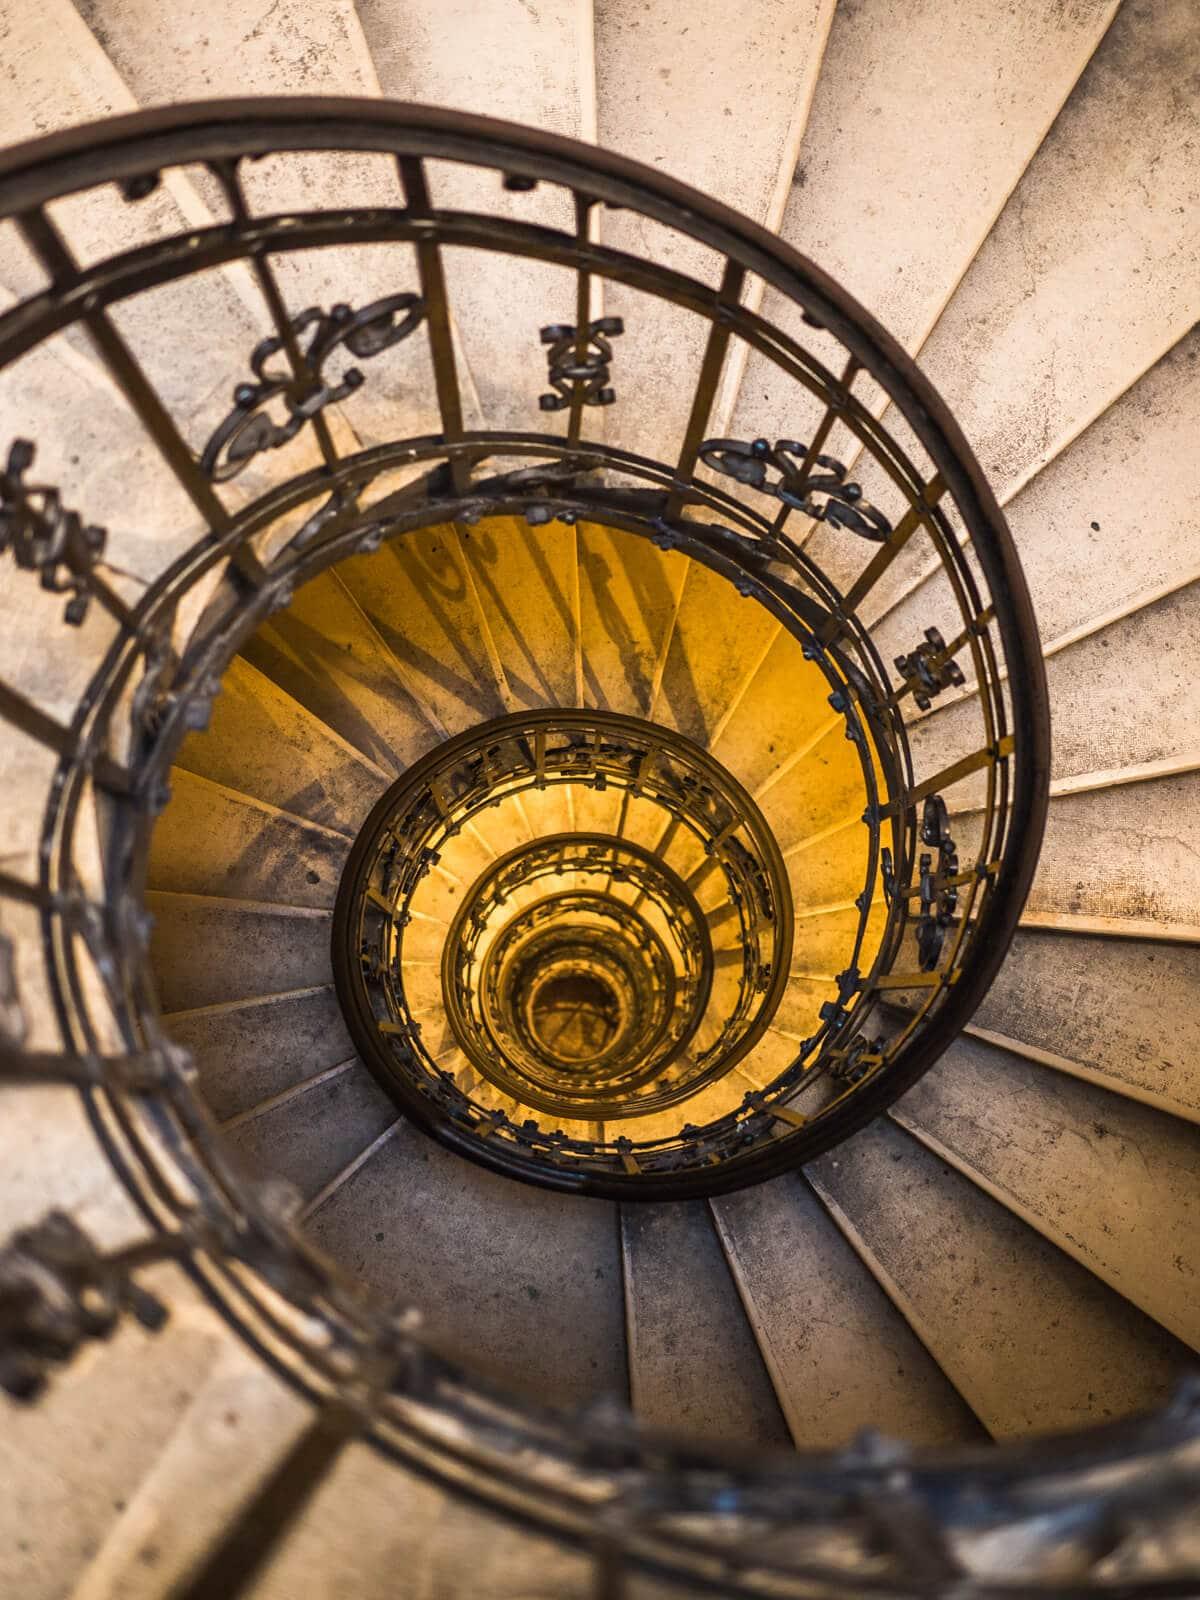 Budapest Instagram photo guide - St. Stephen's Basilica